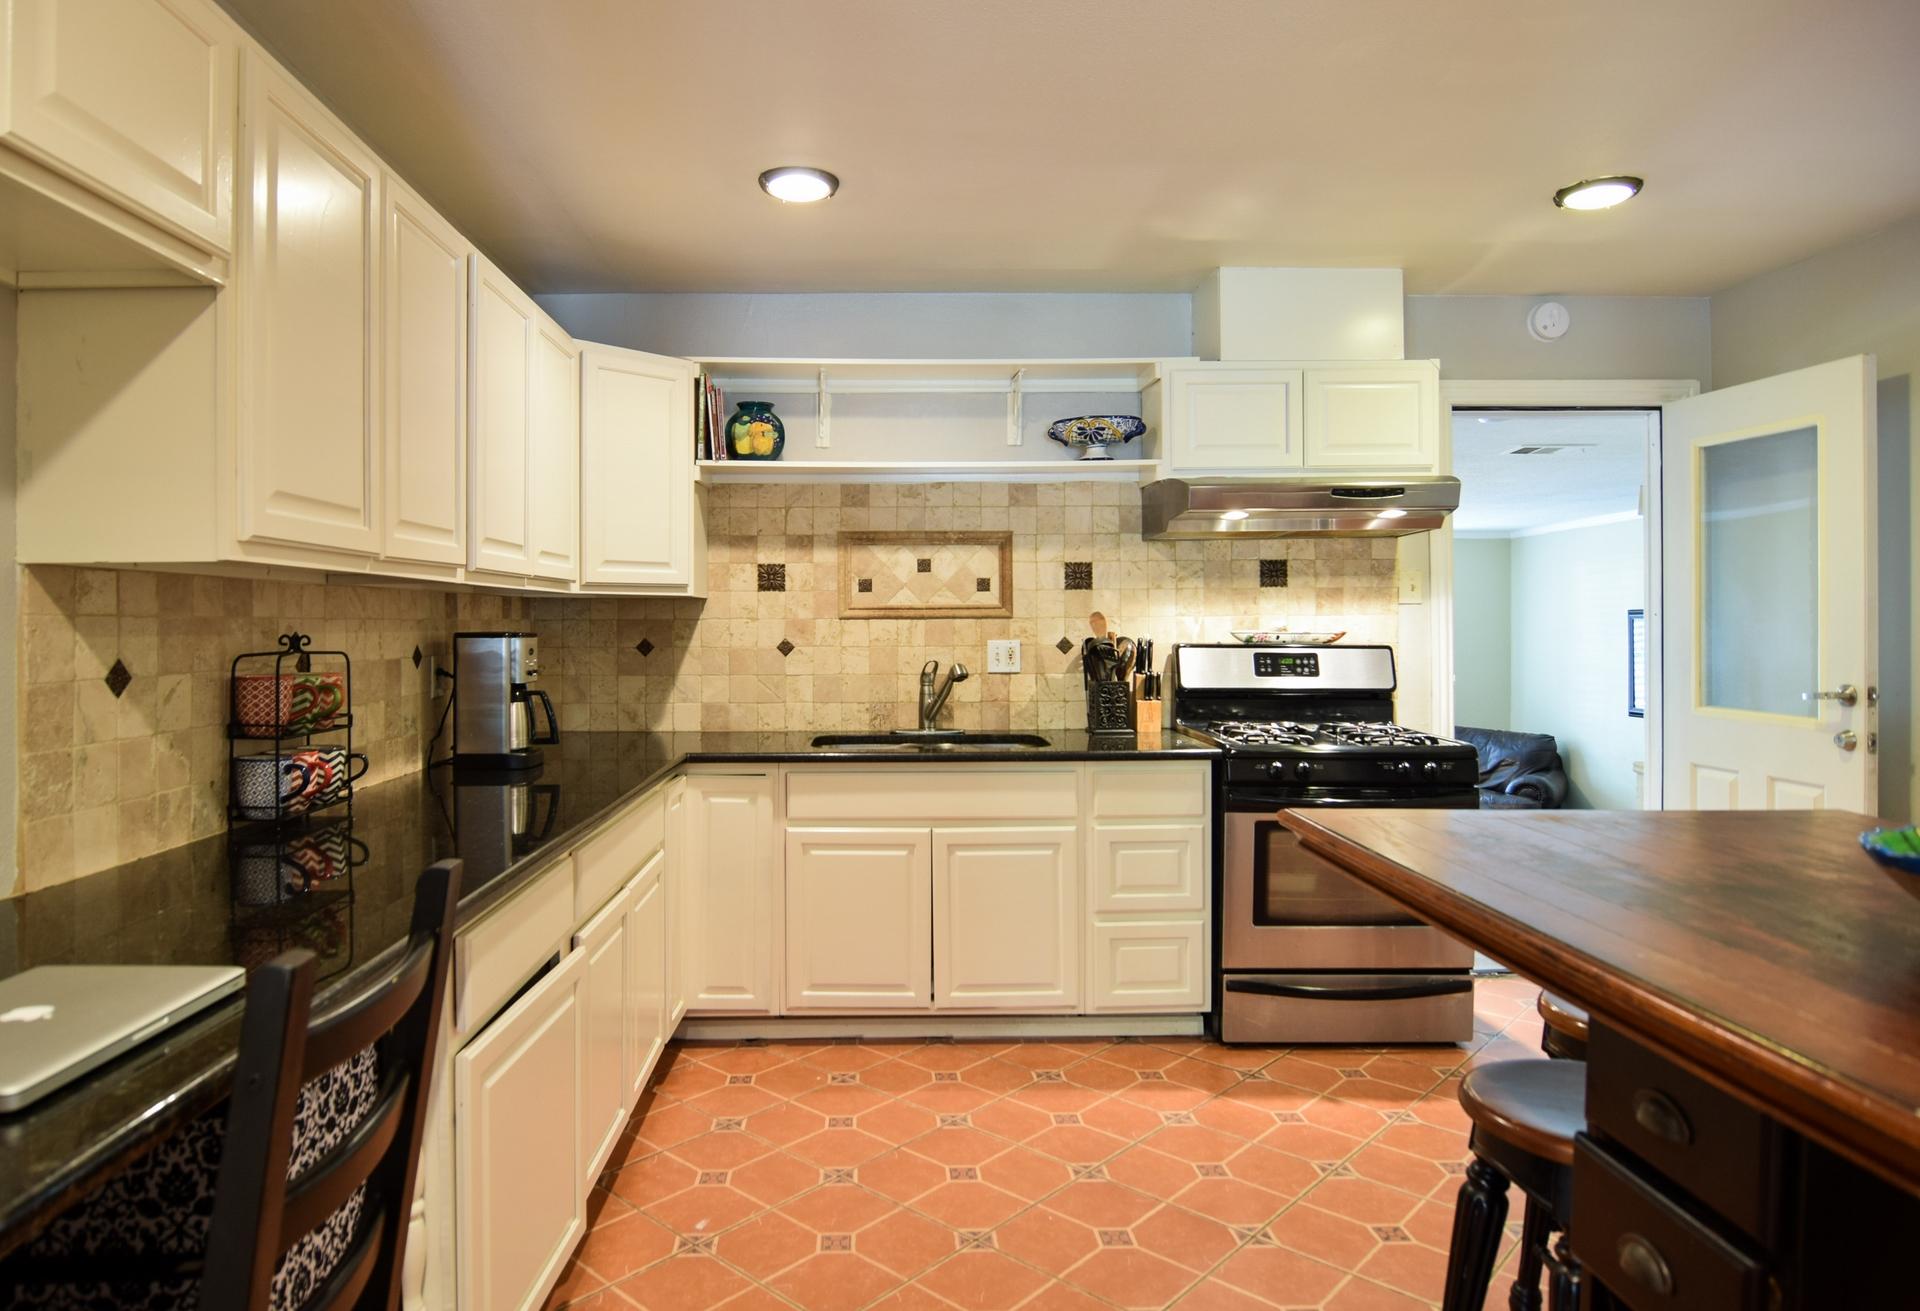 Kitchen2 3112 Catamore Dr Dallas TX 75229.jpg